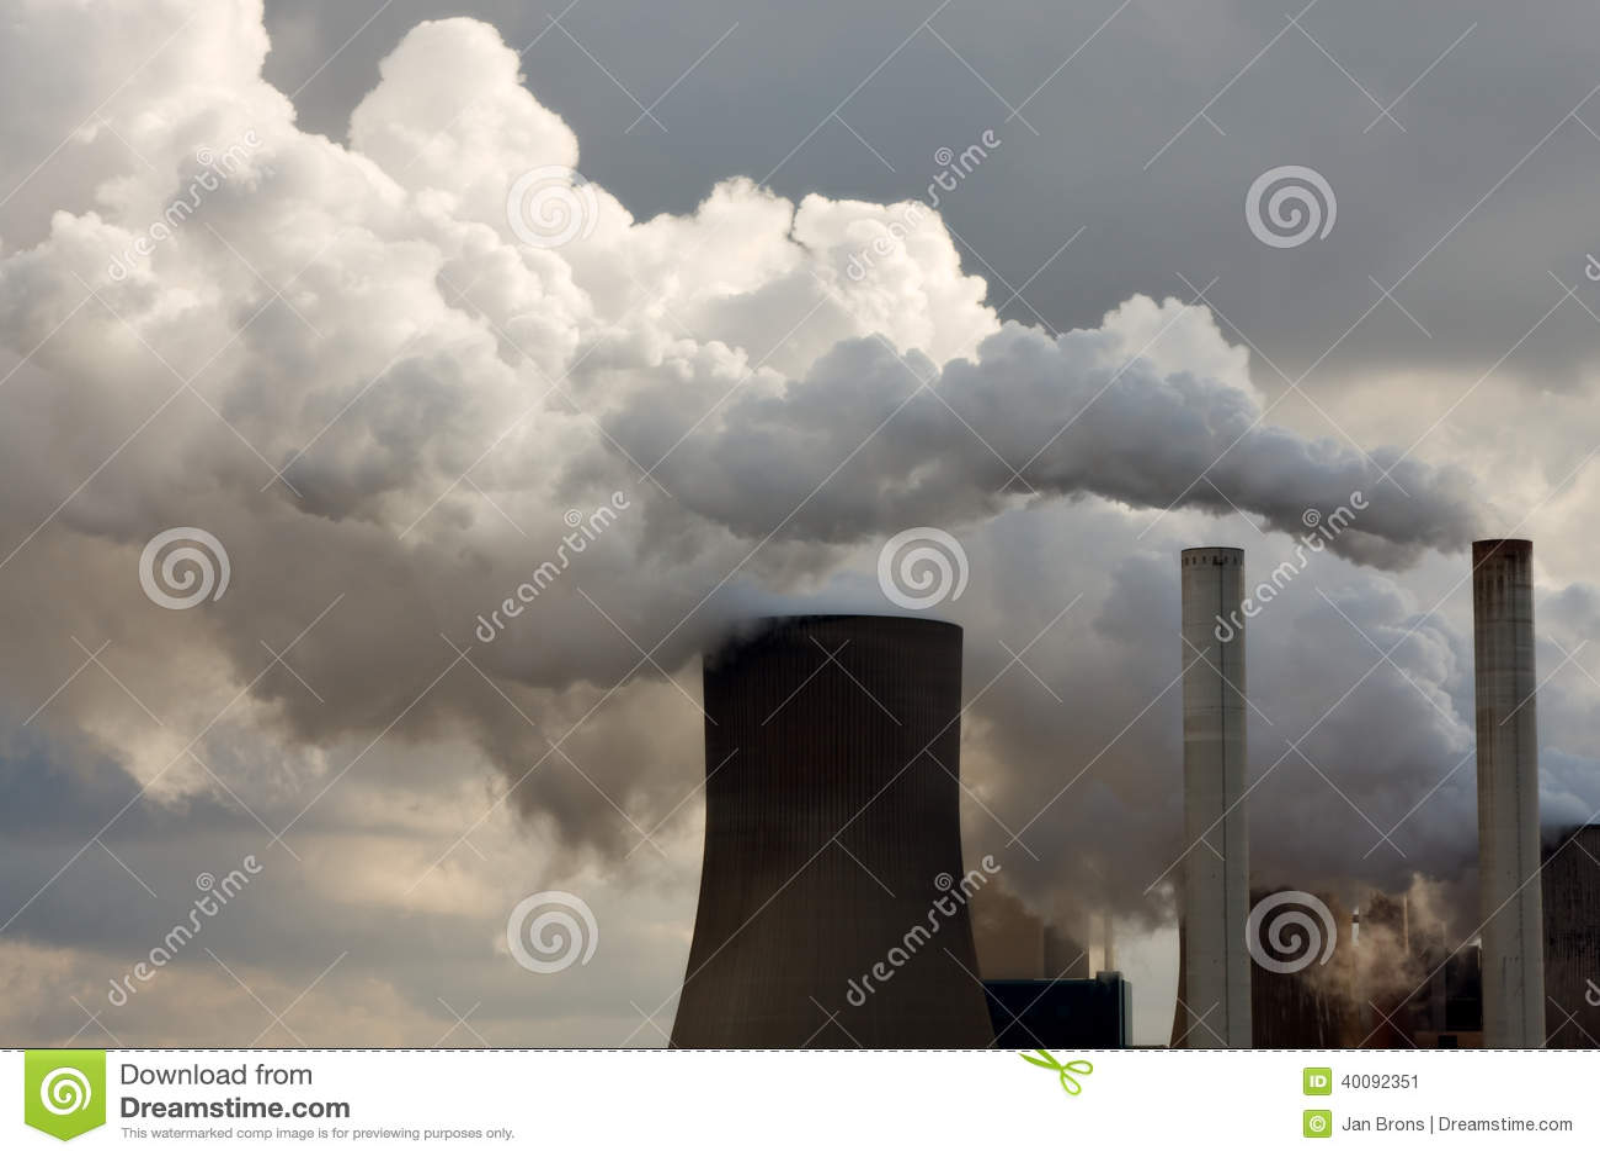 Steenkoolkrachtcentrale die weg vernietigen